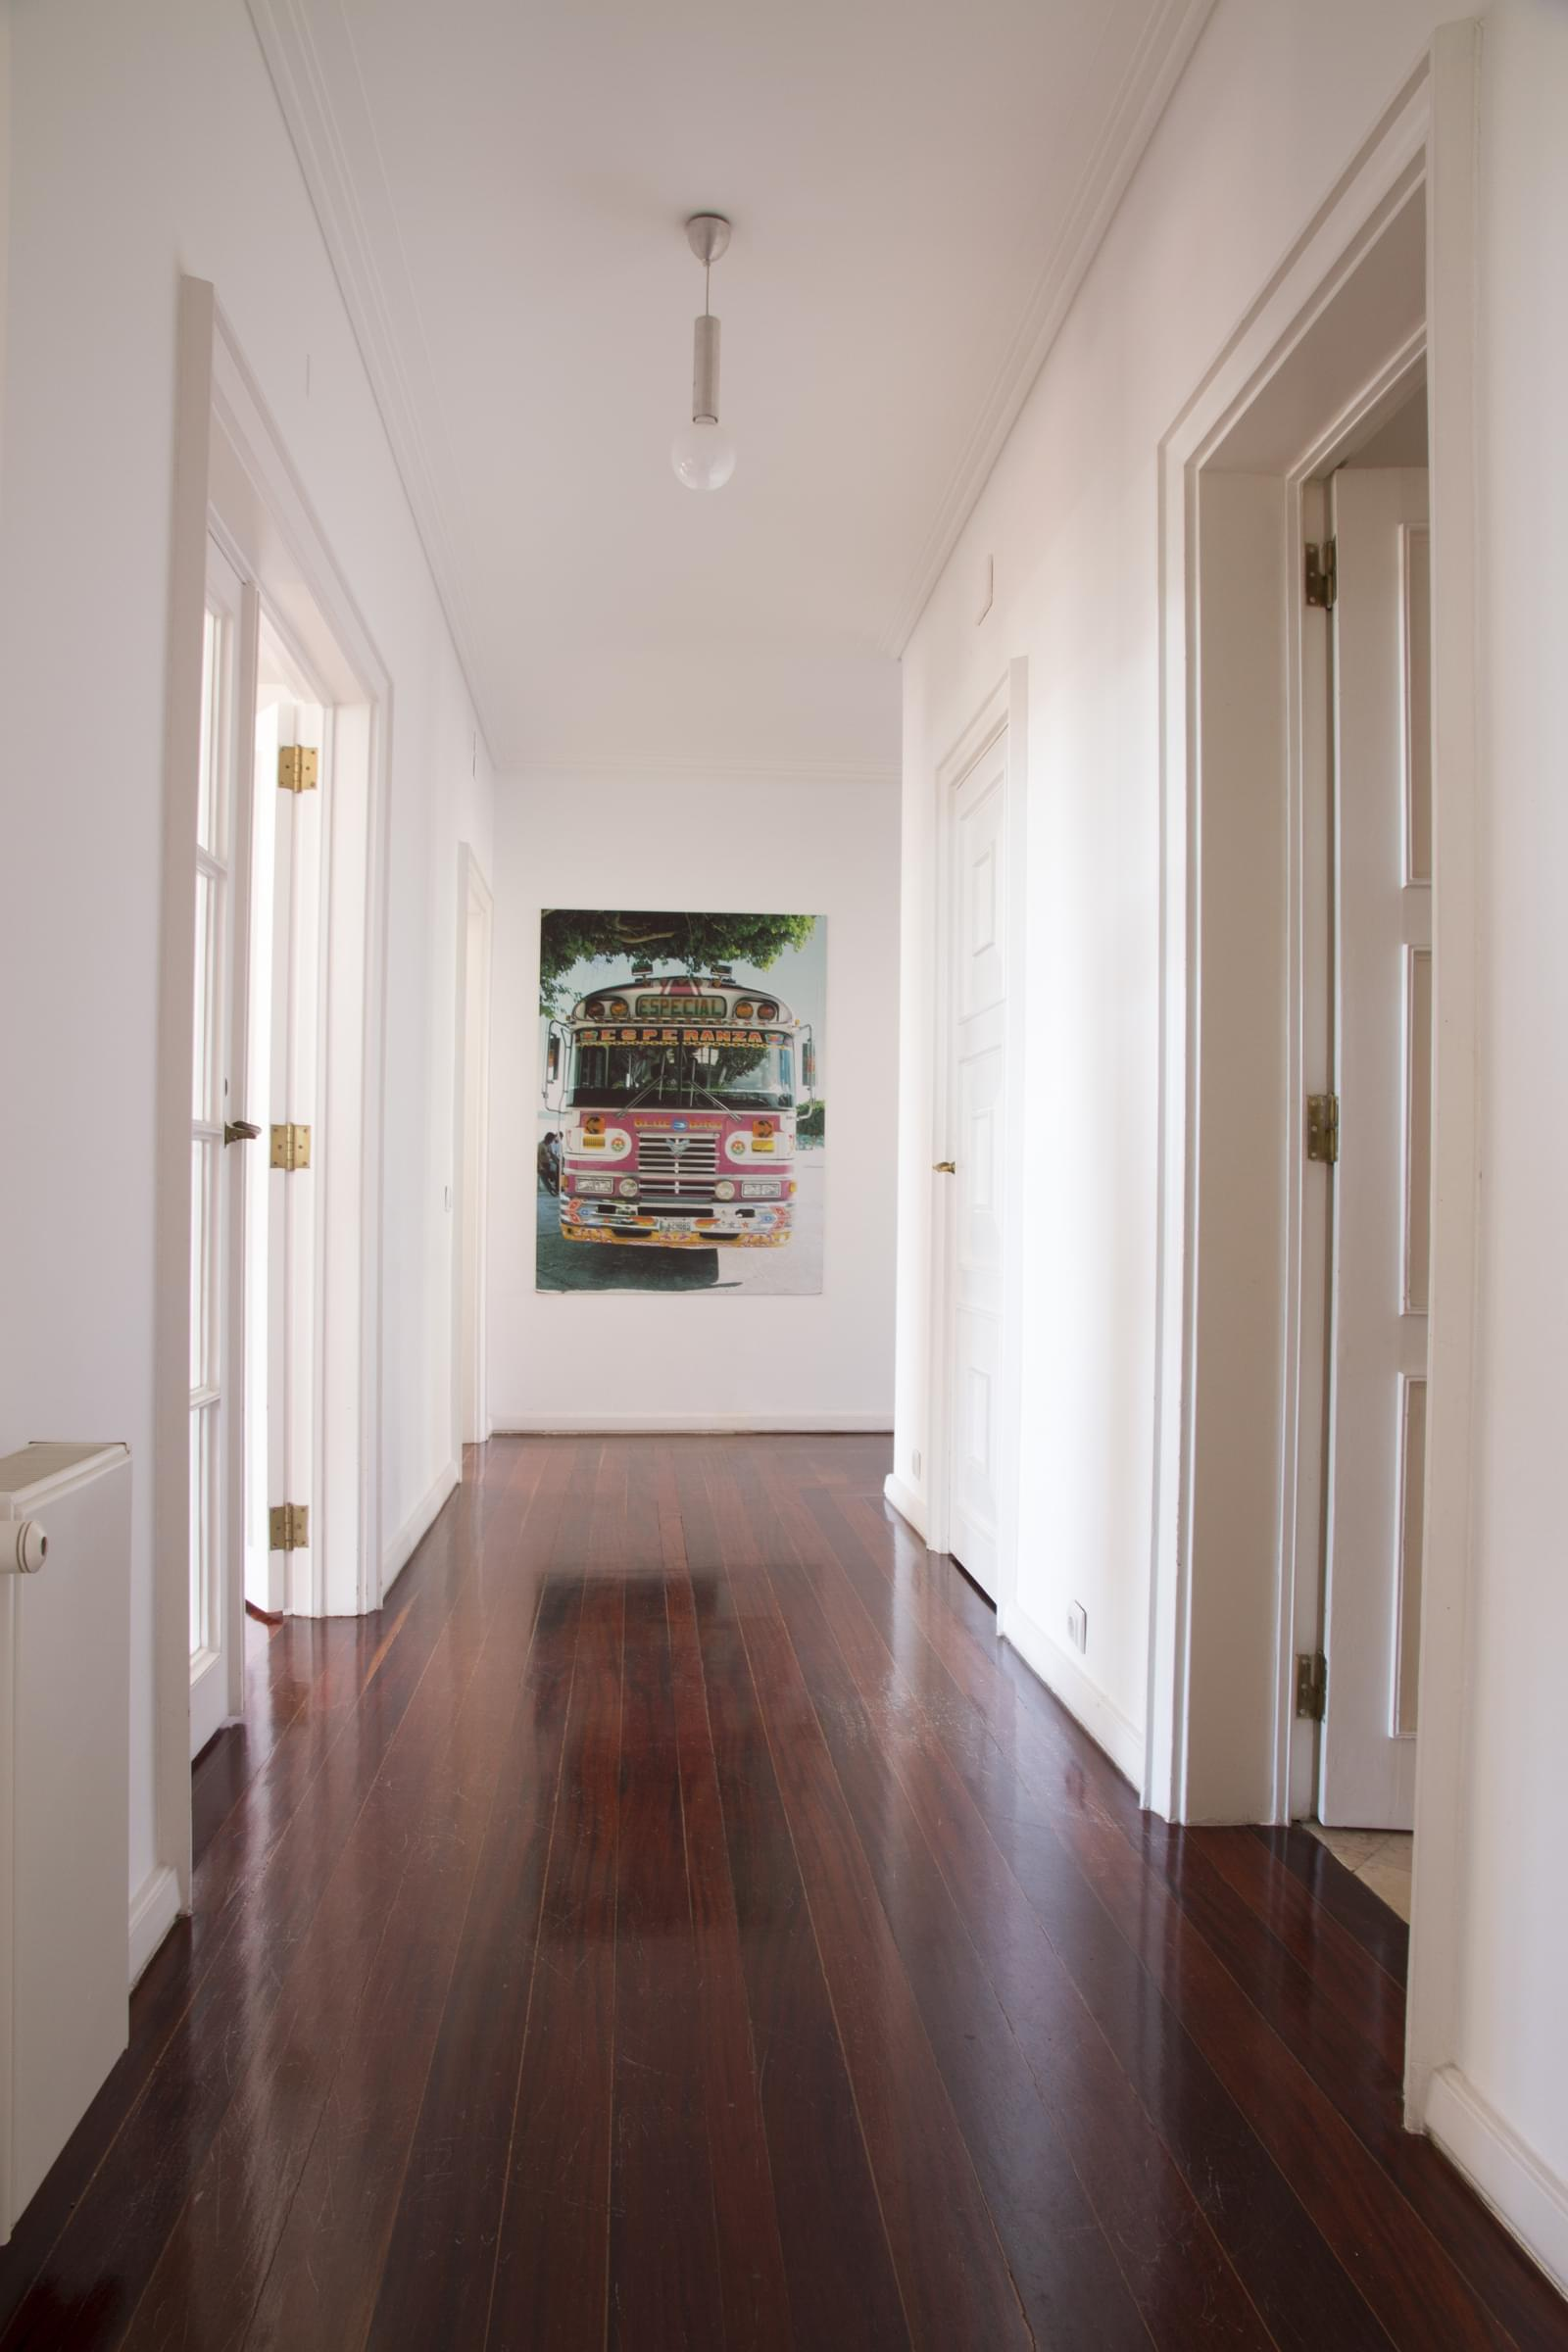 pf18175-apartamento-t5-lisboa-af980497-18ac-434a-8ba9-39a45c16e53a